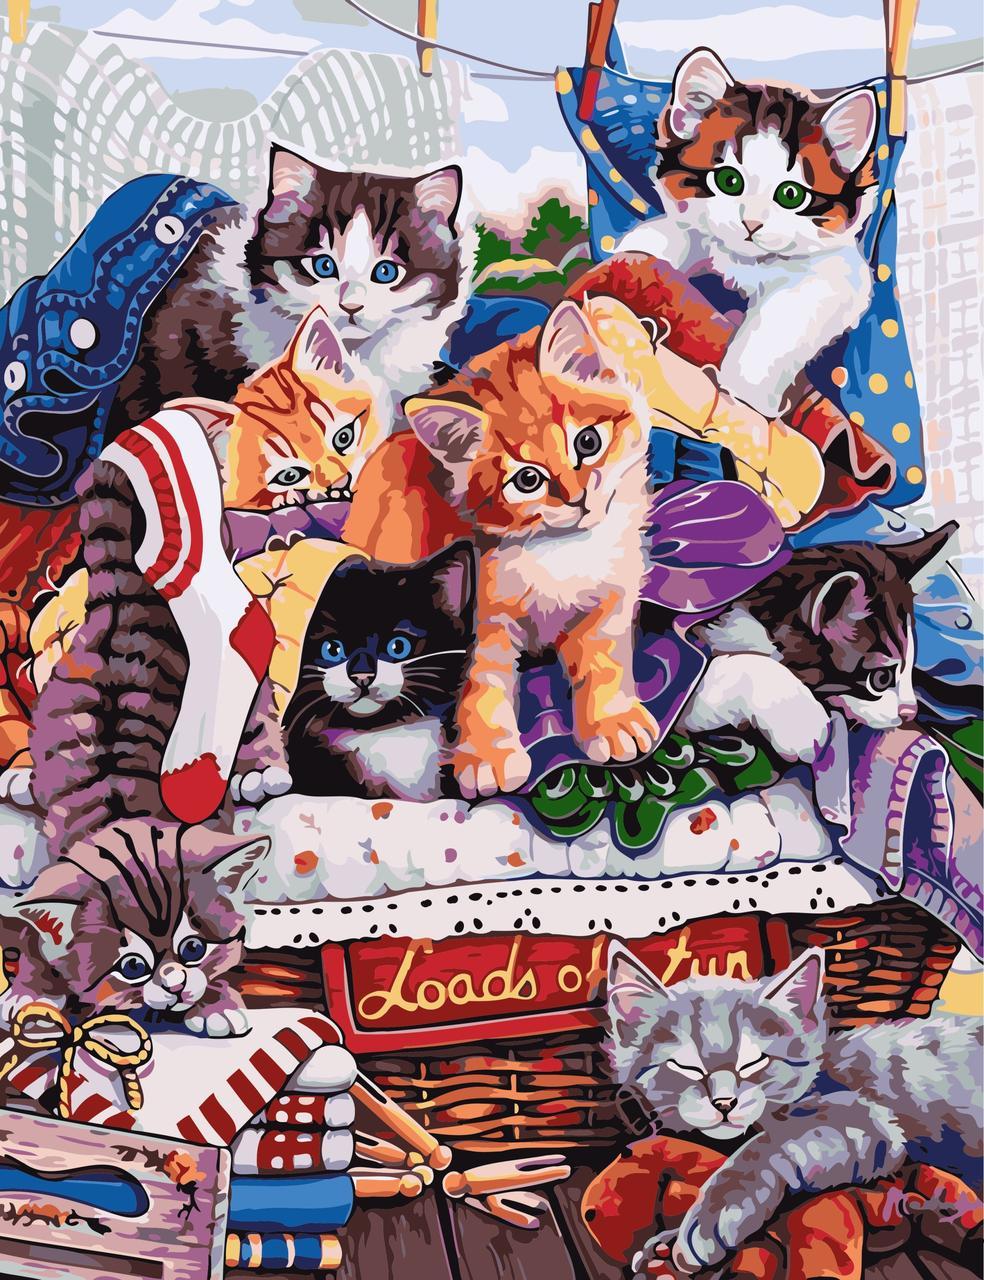 AS0614 Картина-набор по номерам Котята, В картонной коробке